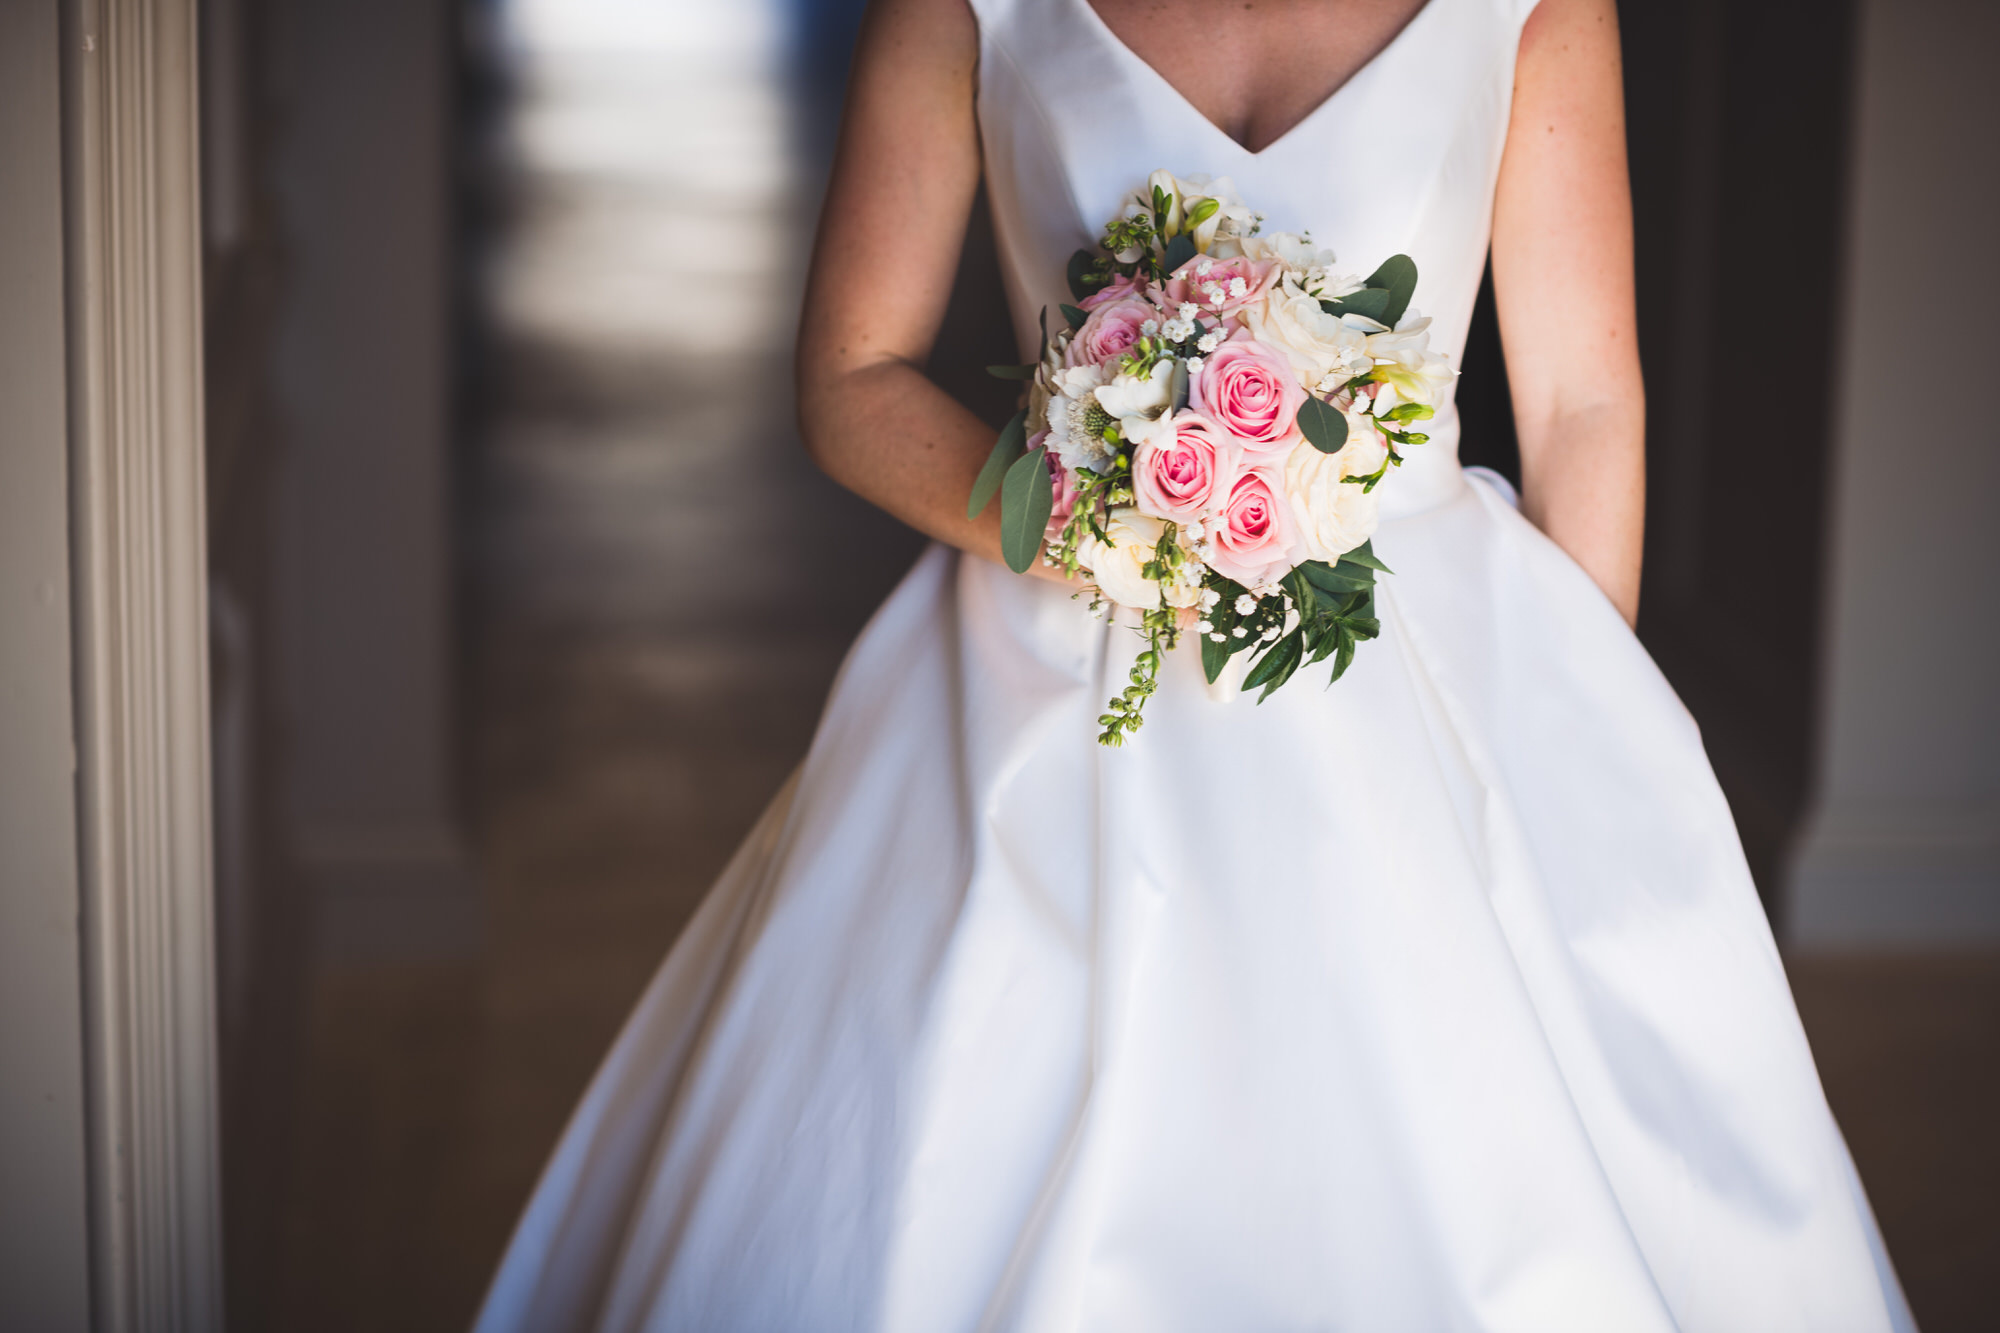 Shilstone wedding photographer 25